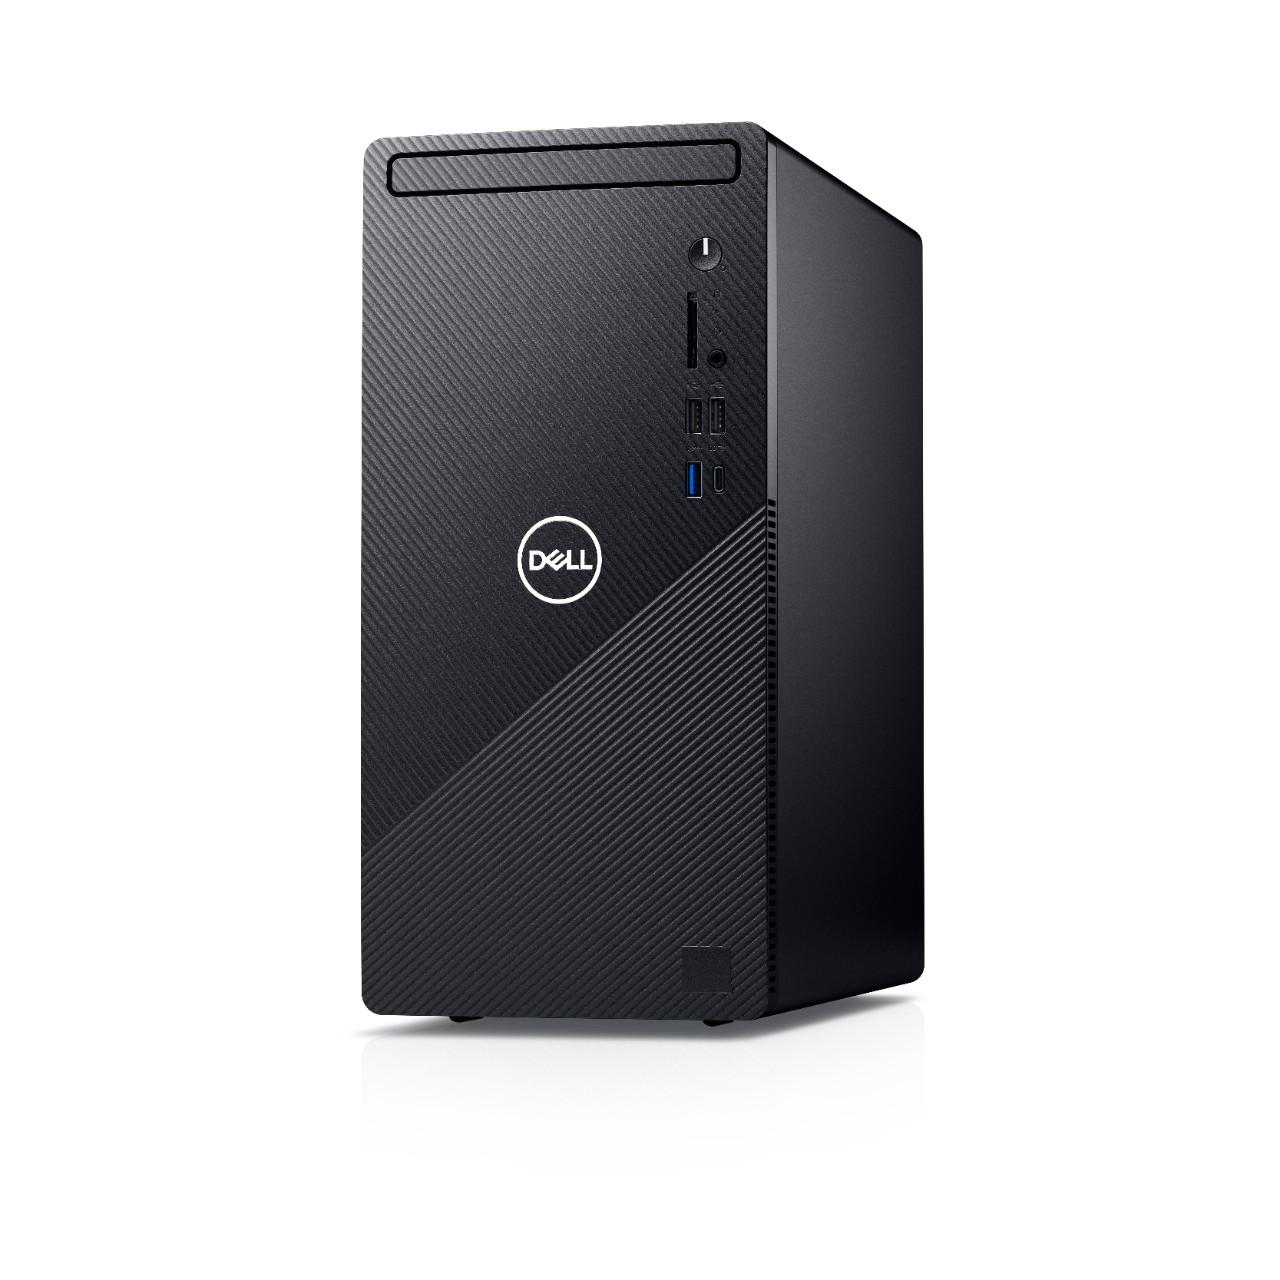 Dell Inspiron DT 3891 i5-10400/8GB/512GB/DVD/W10Pro/3RNBD/Černý - 3891-38026